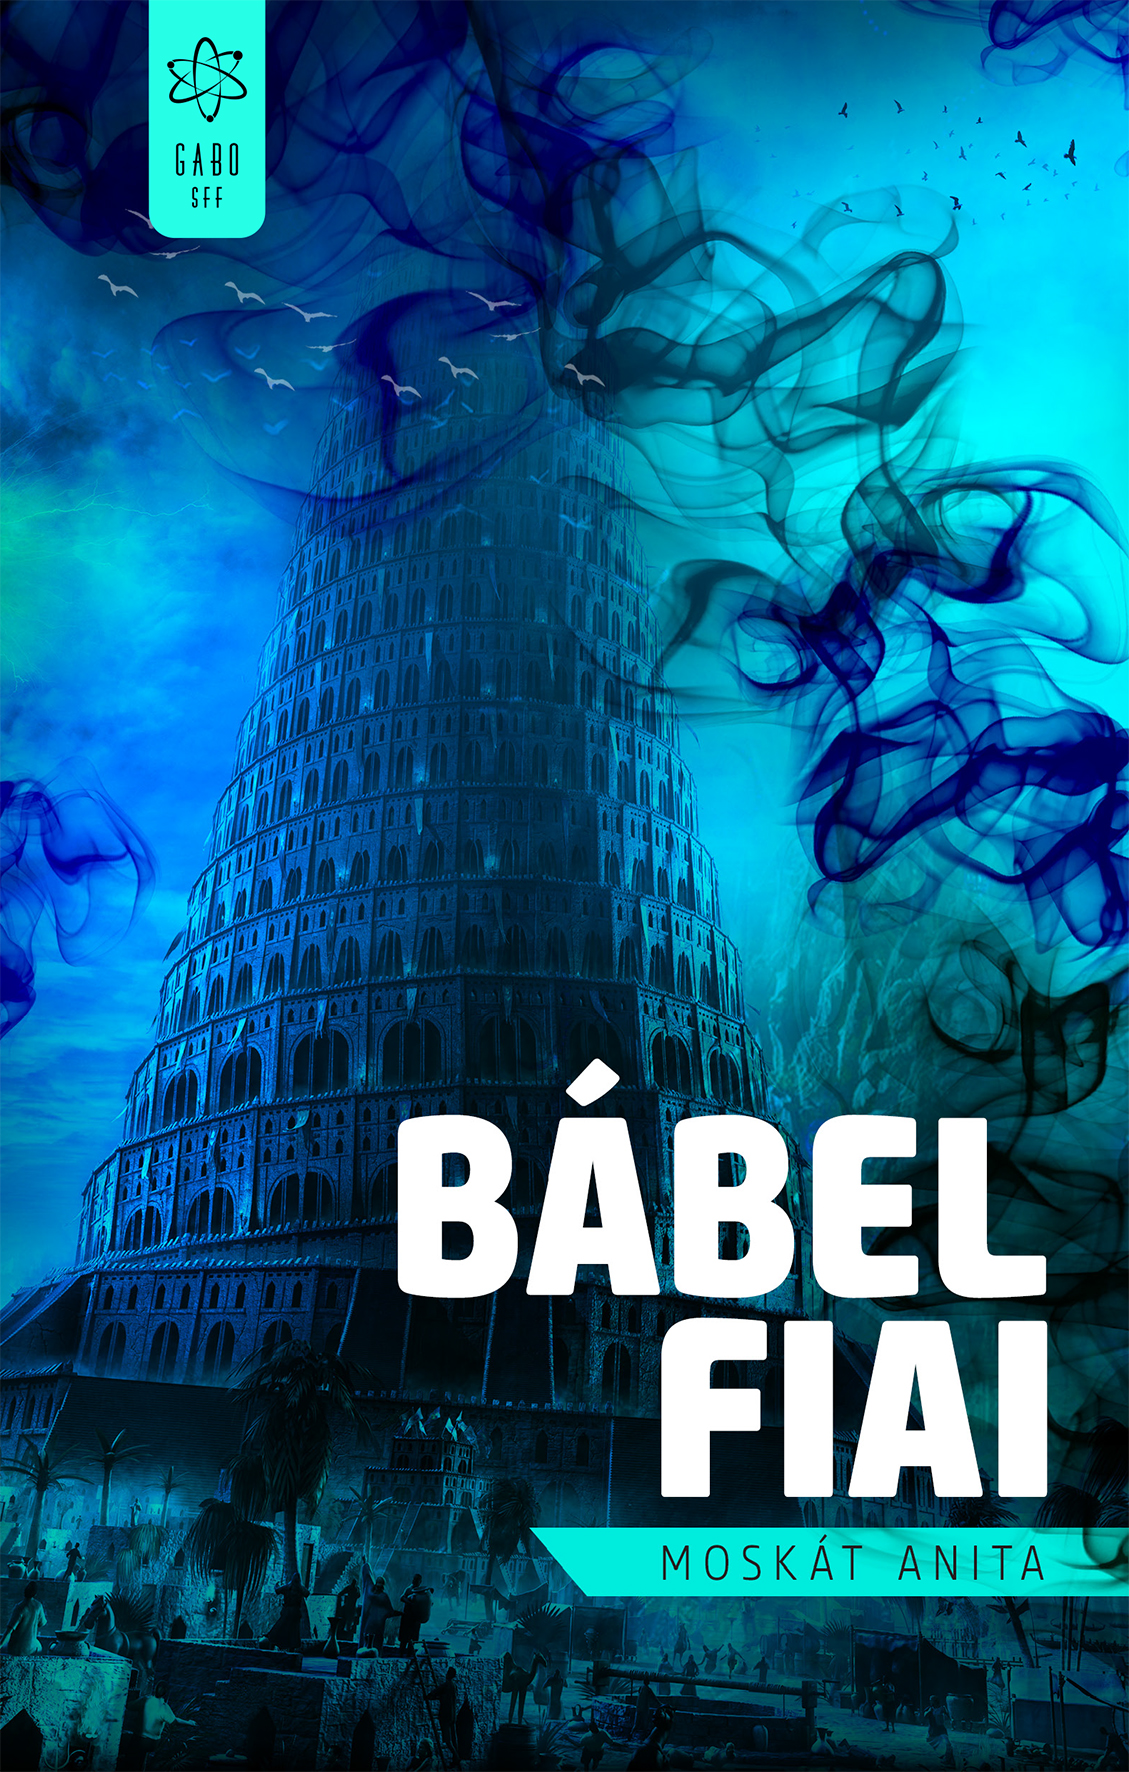 Babel_fiai_MEDIA.jpg